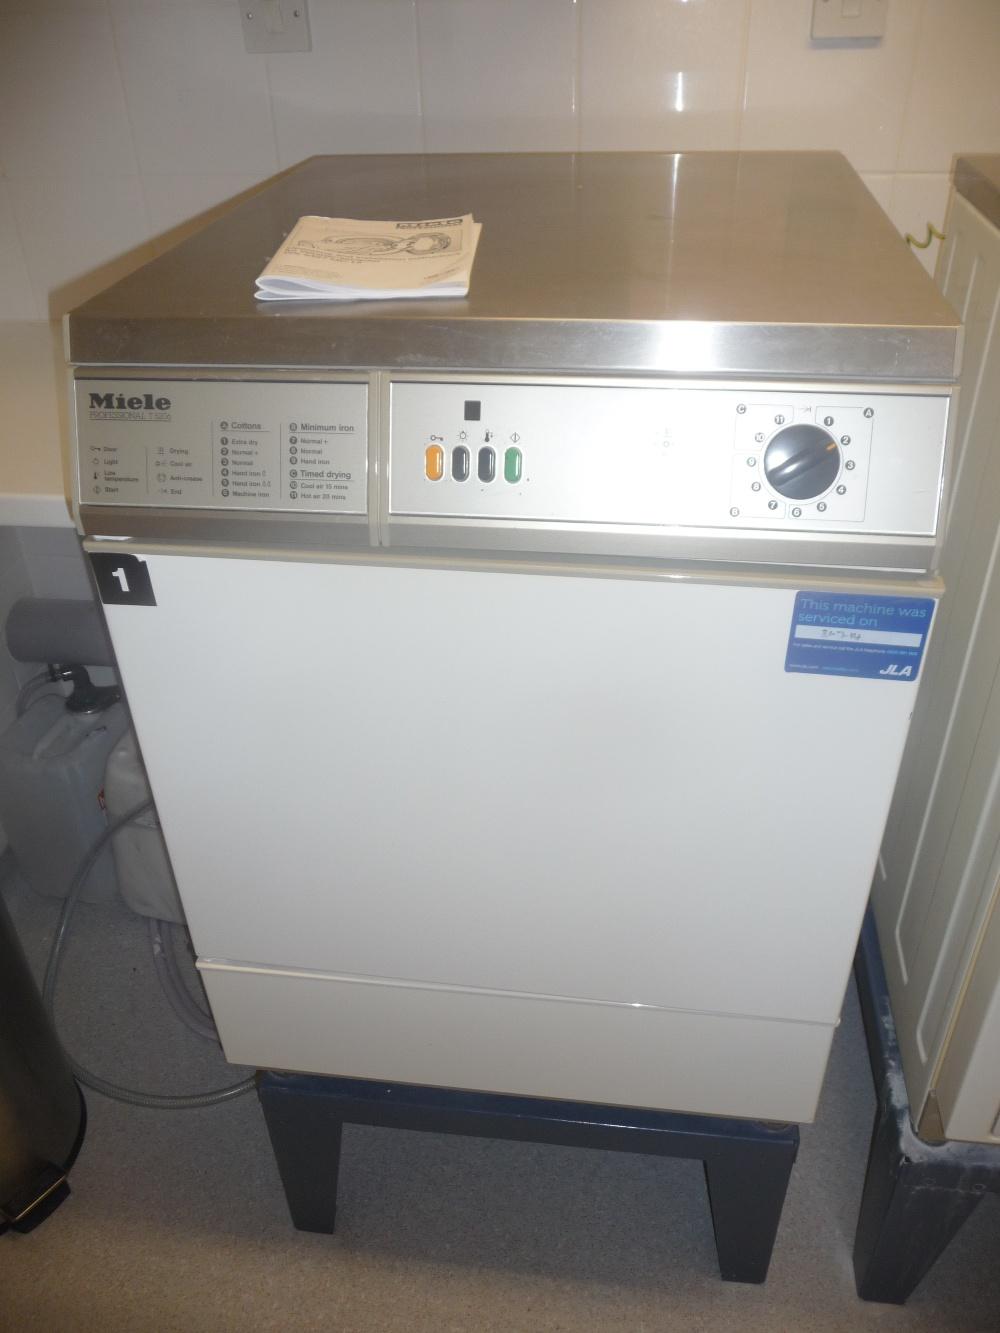 miele professional t5206 tumble dryer. Black Bedroom Furniture Sets. Home Design Ideas